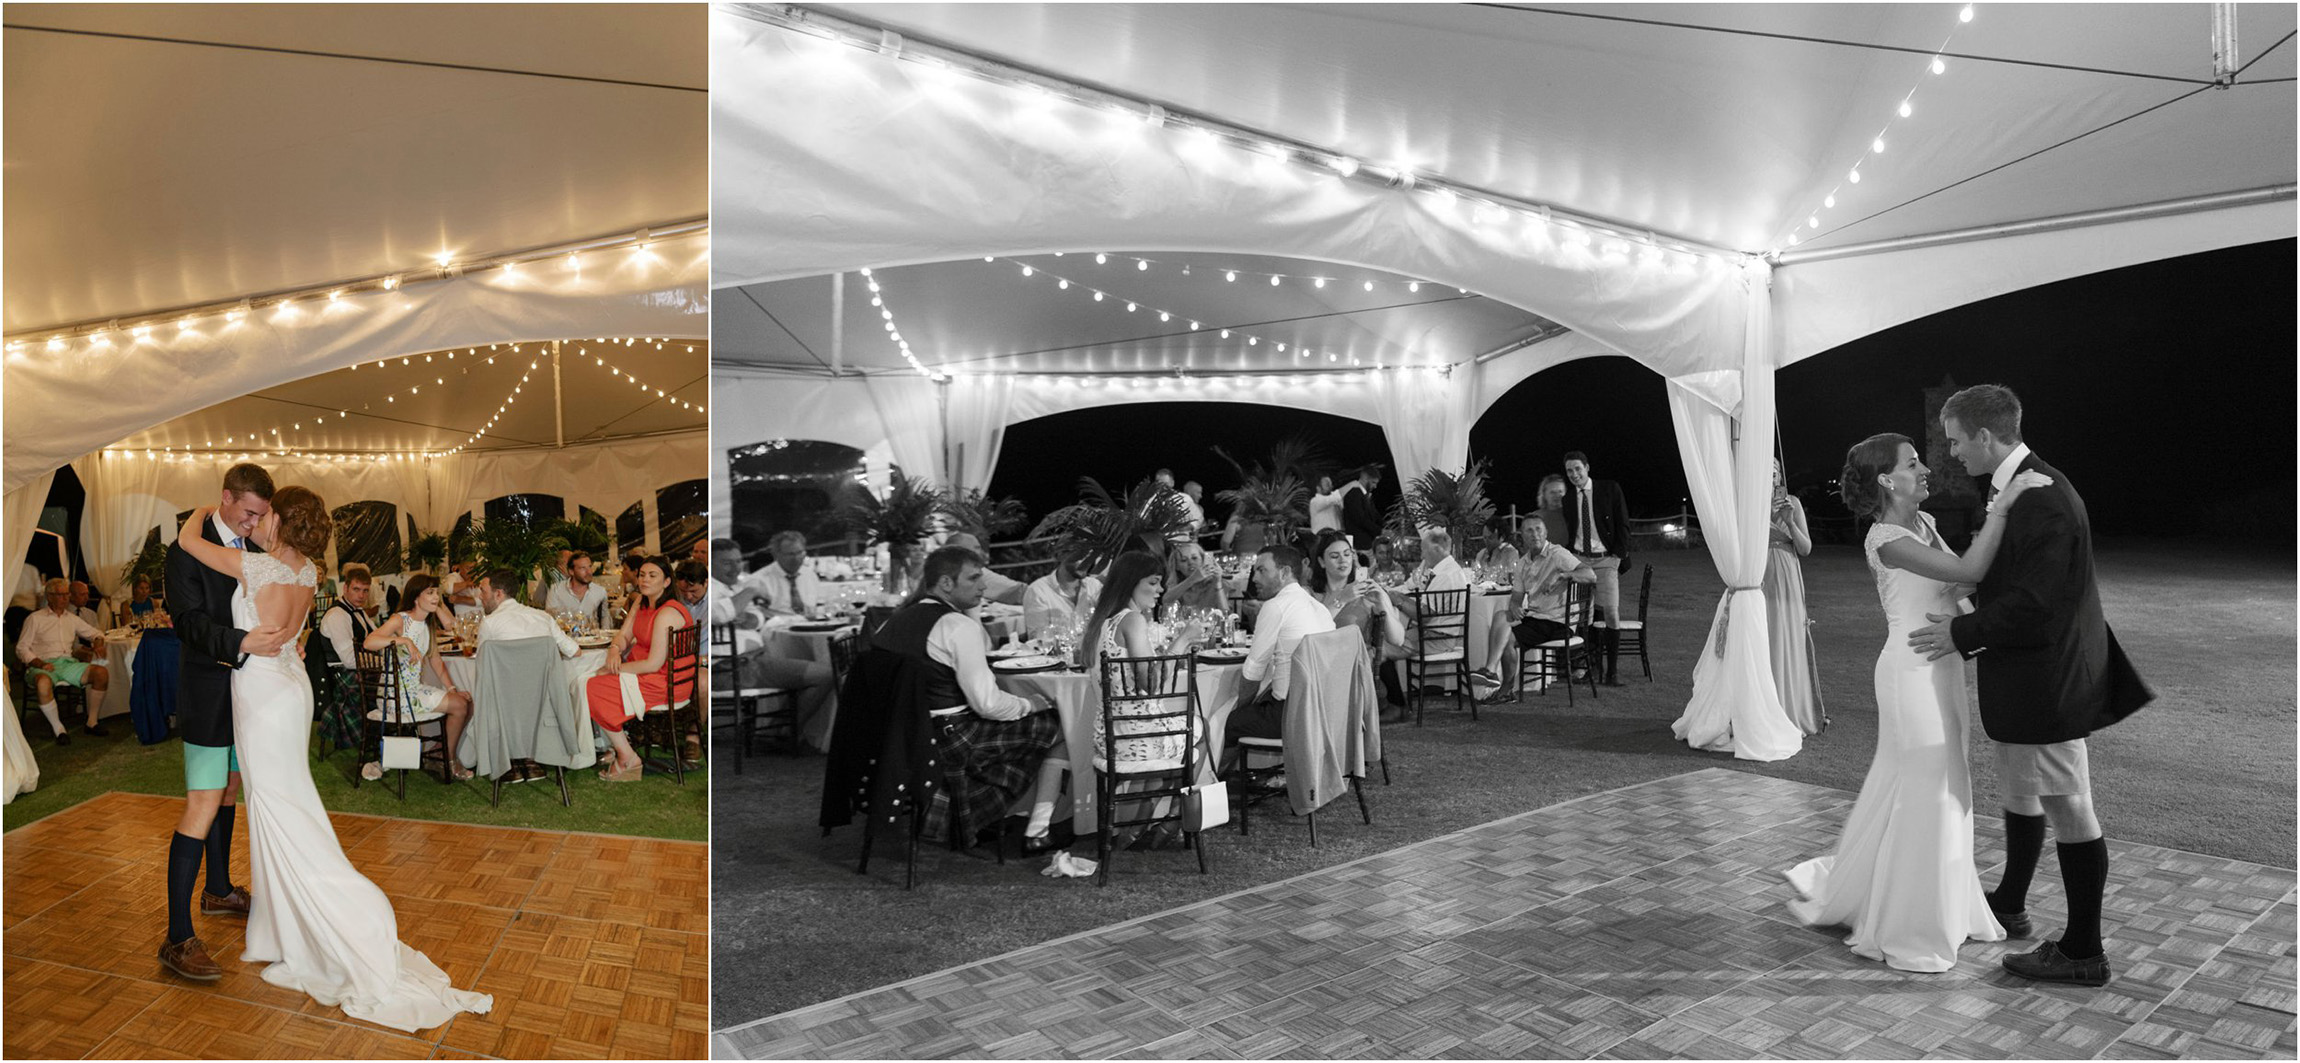 ©FianderFoto_Bermuda Wedding Photographer_Mid Ocean_Rachel_Angus_116.jpg